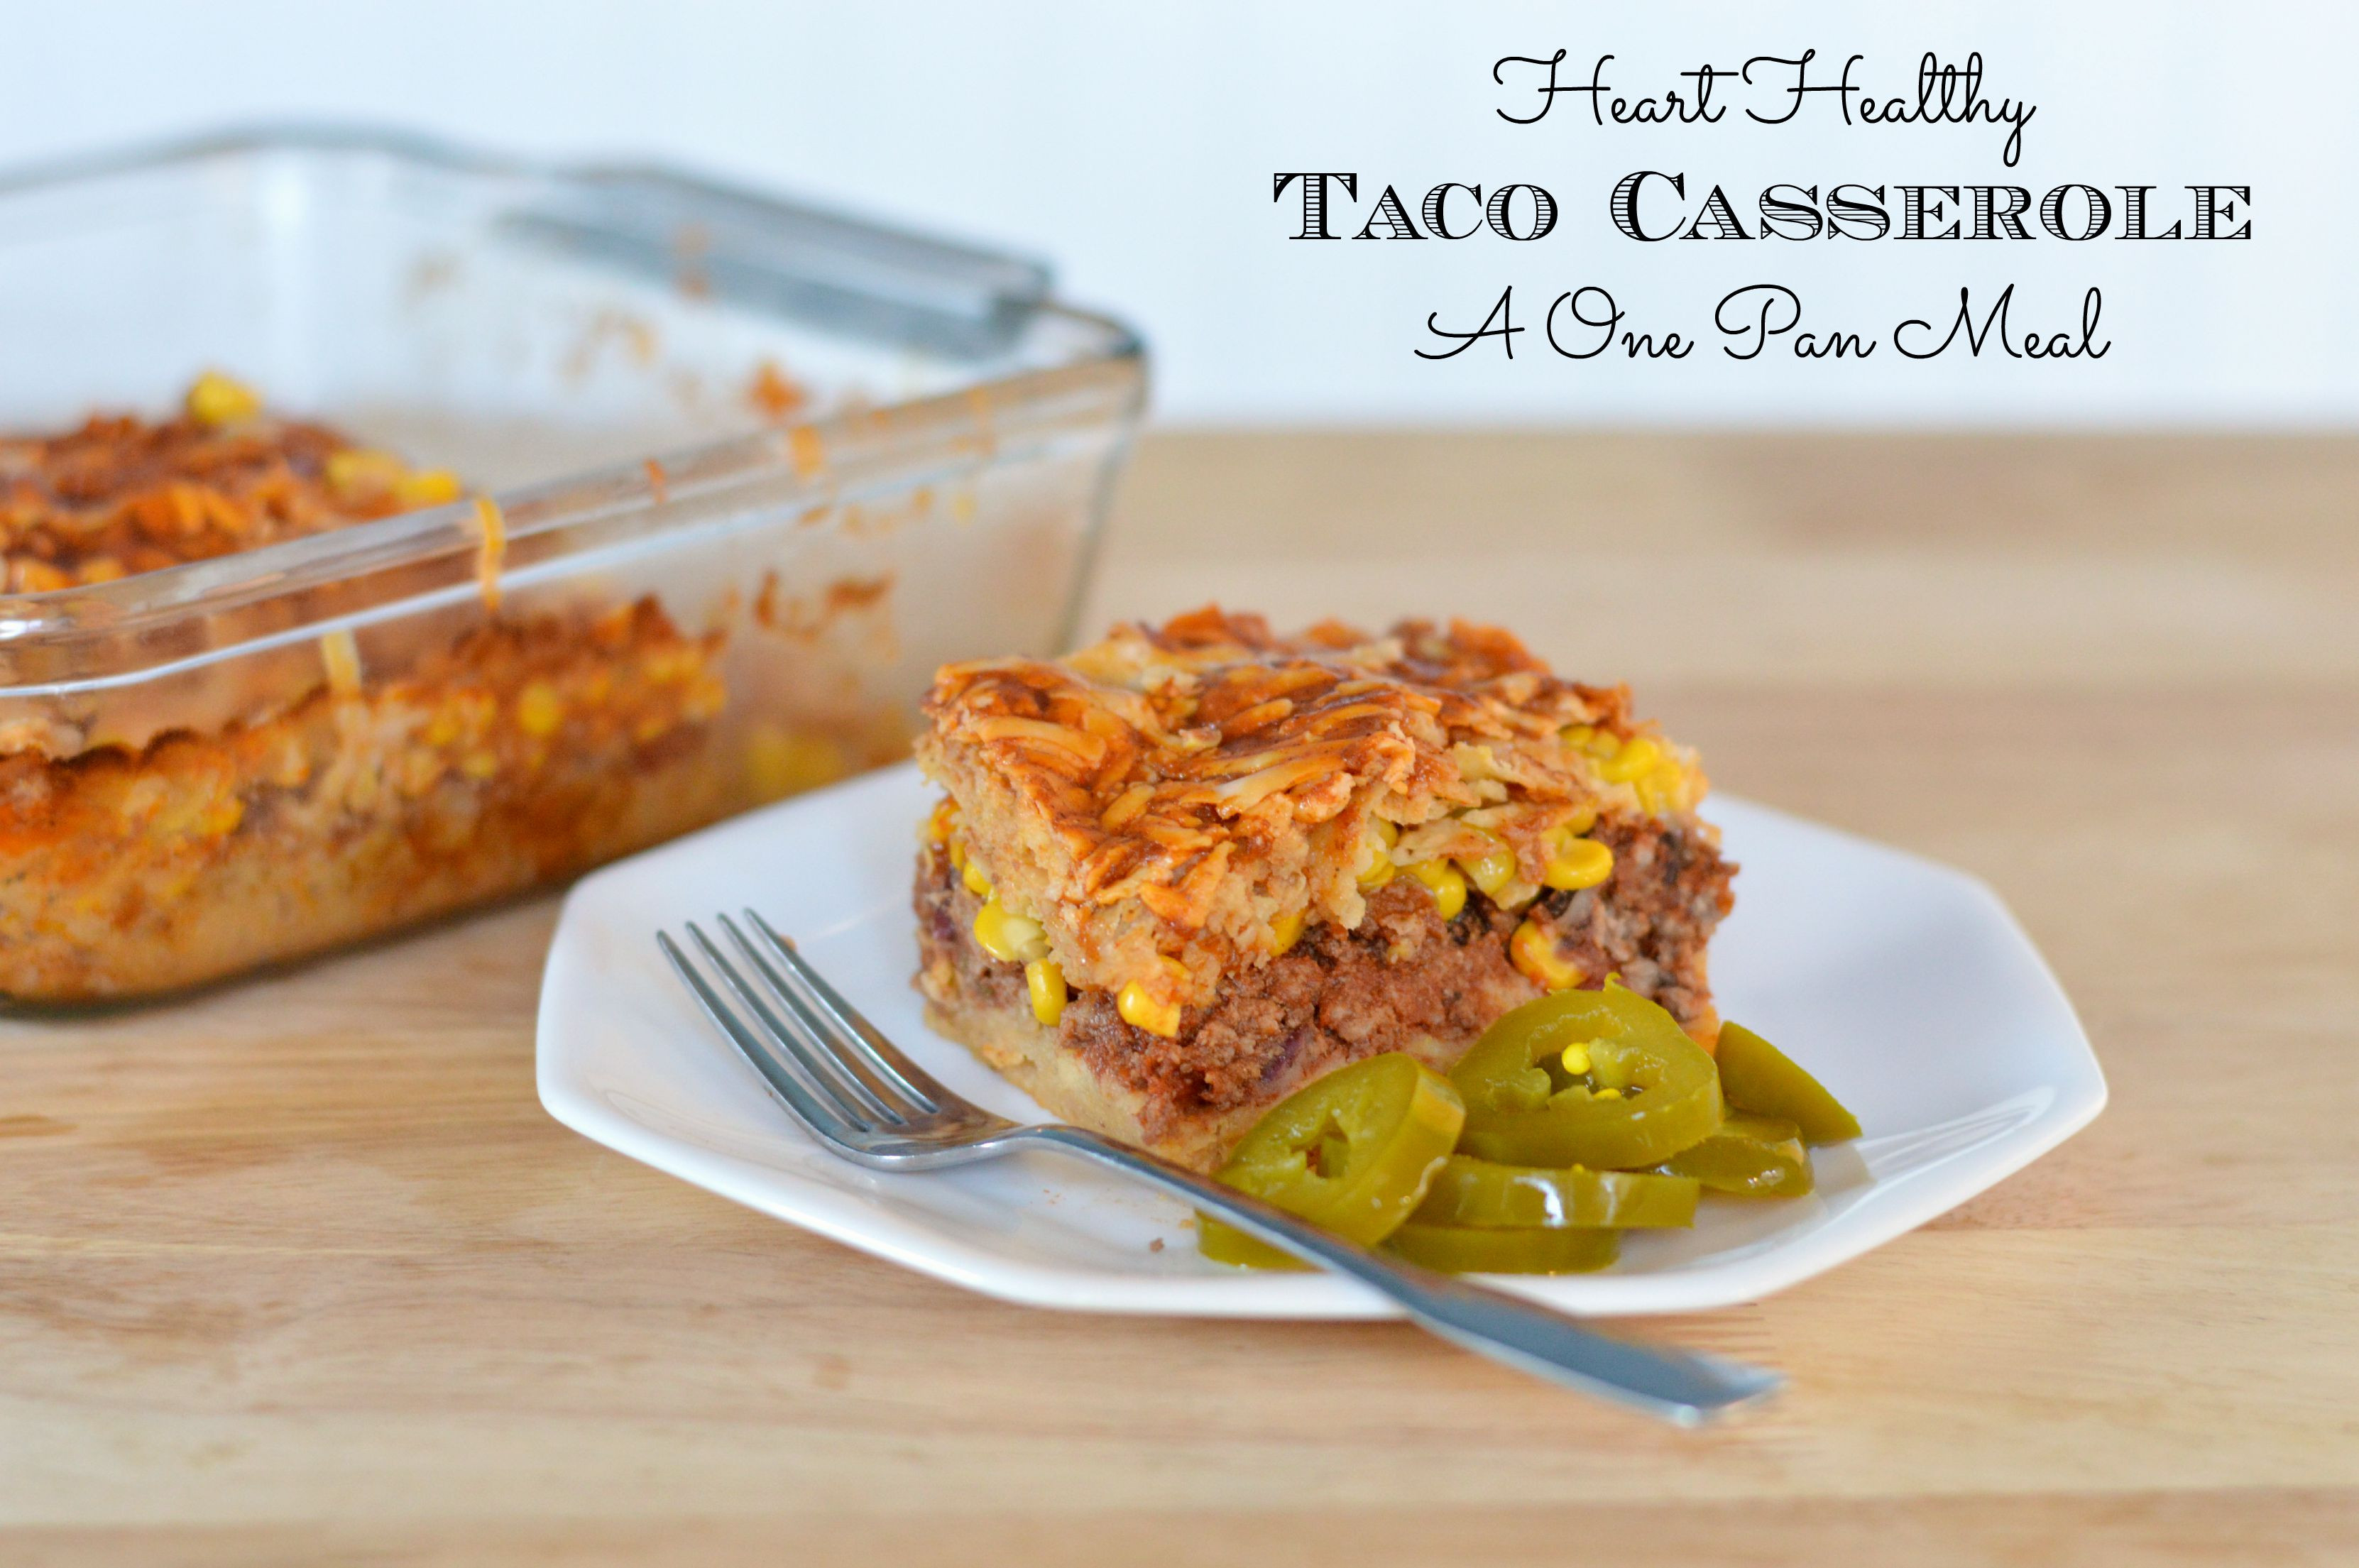 Heart Healthy Chicken Casseroles  e Pan Heart Healthy Taco Casserole